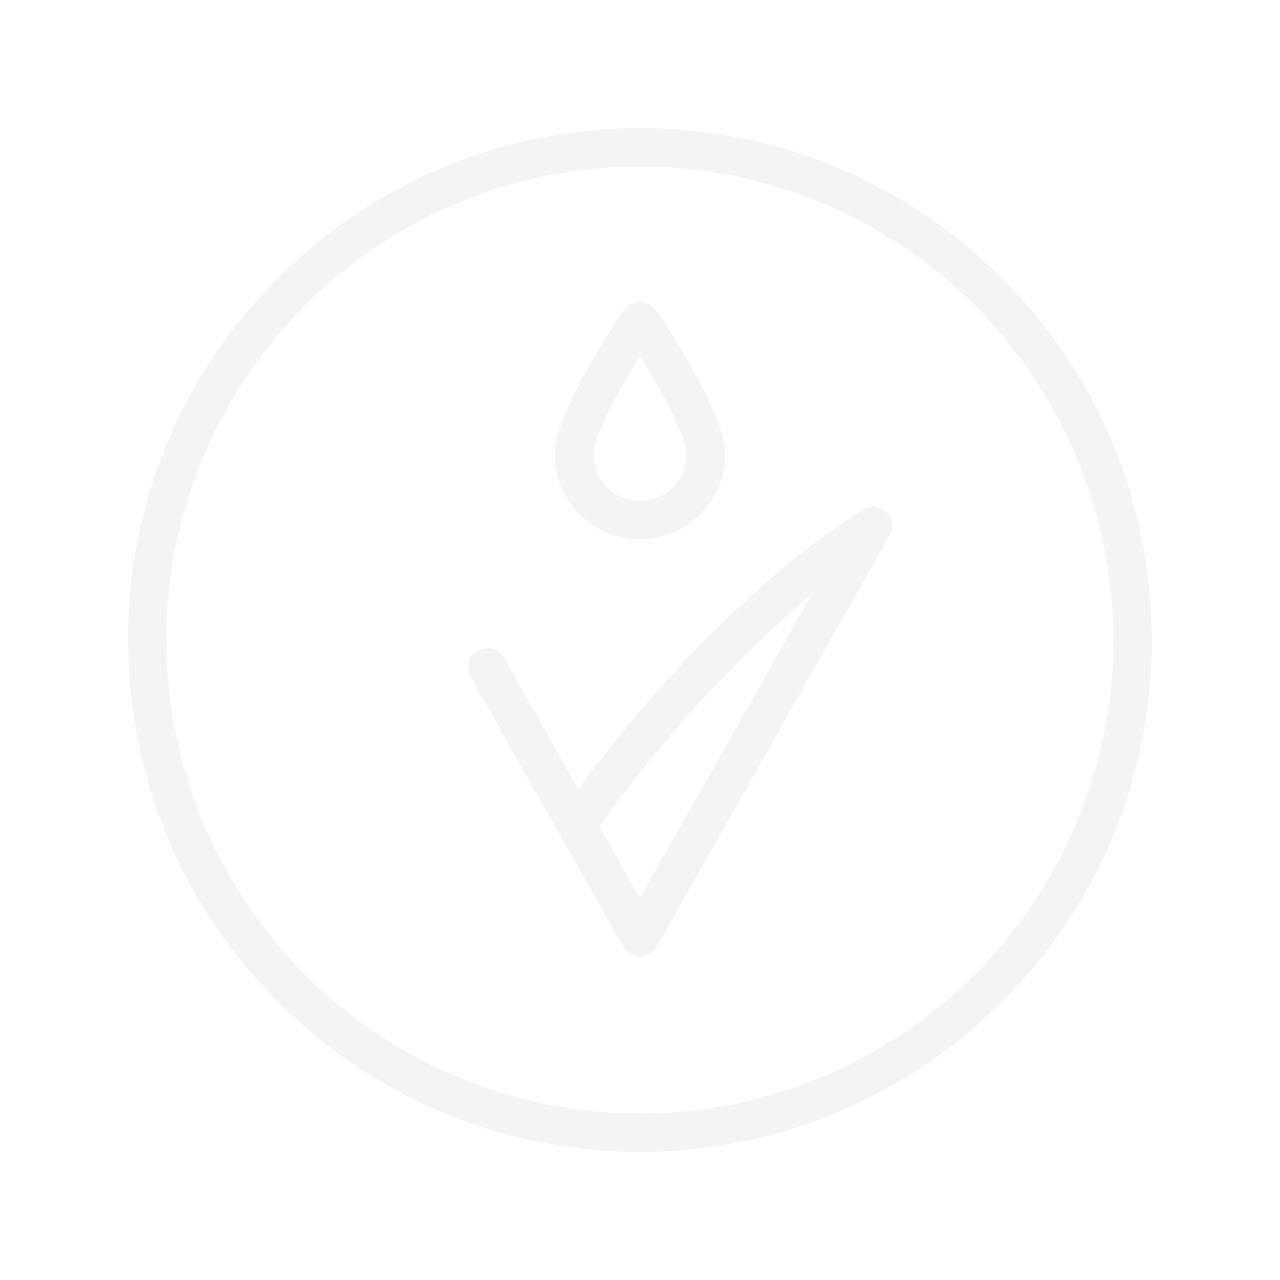 MATRIX R.A.W. Biolage Nourish Shampoo